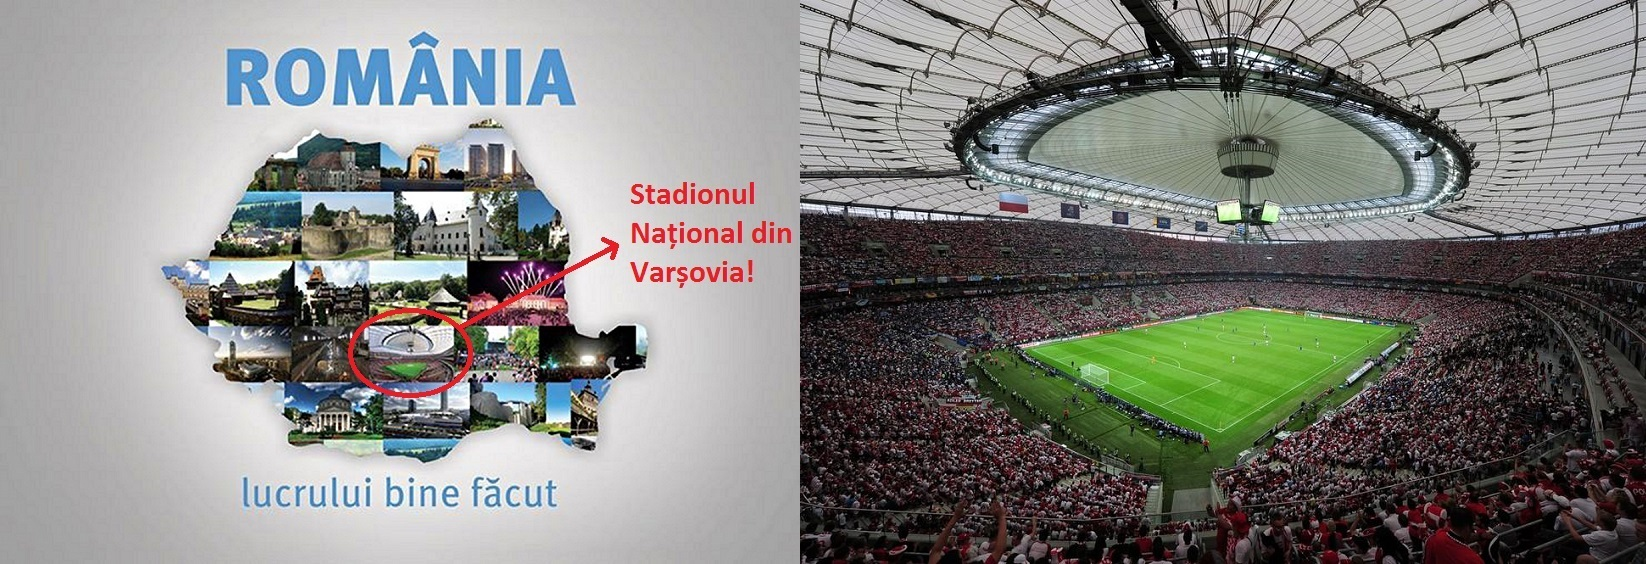 Prezidentiabilul ACL a folosit in campanie poze din Varsovia